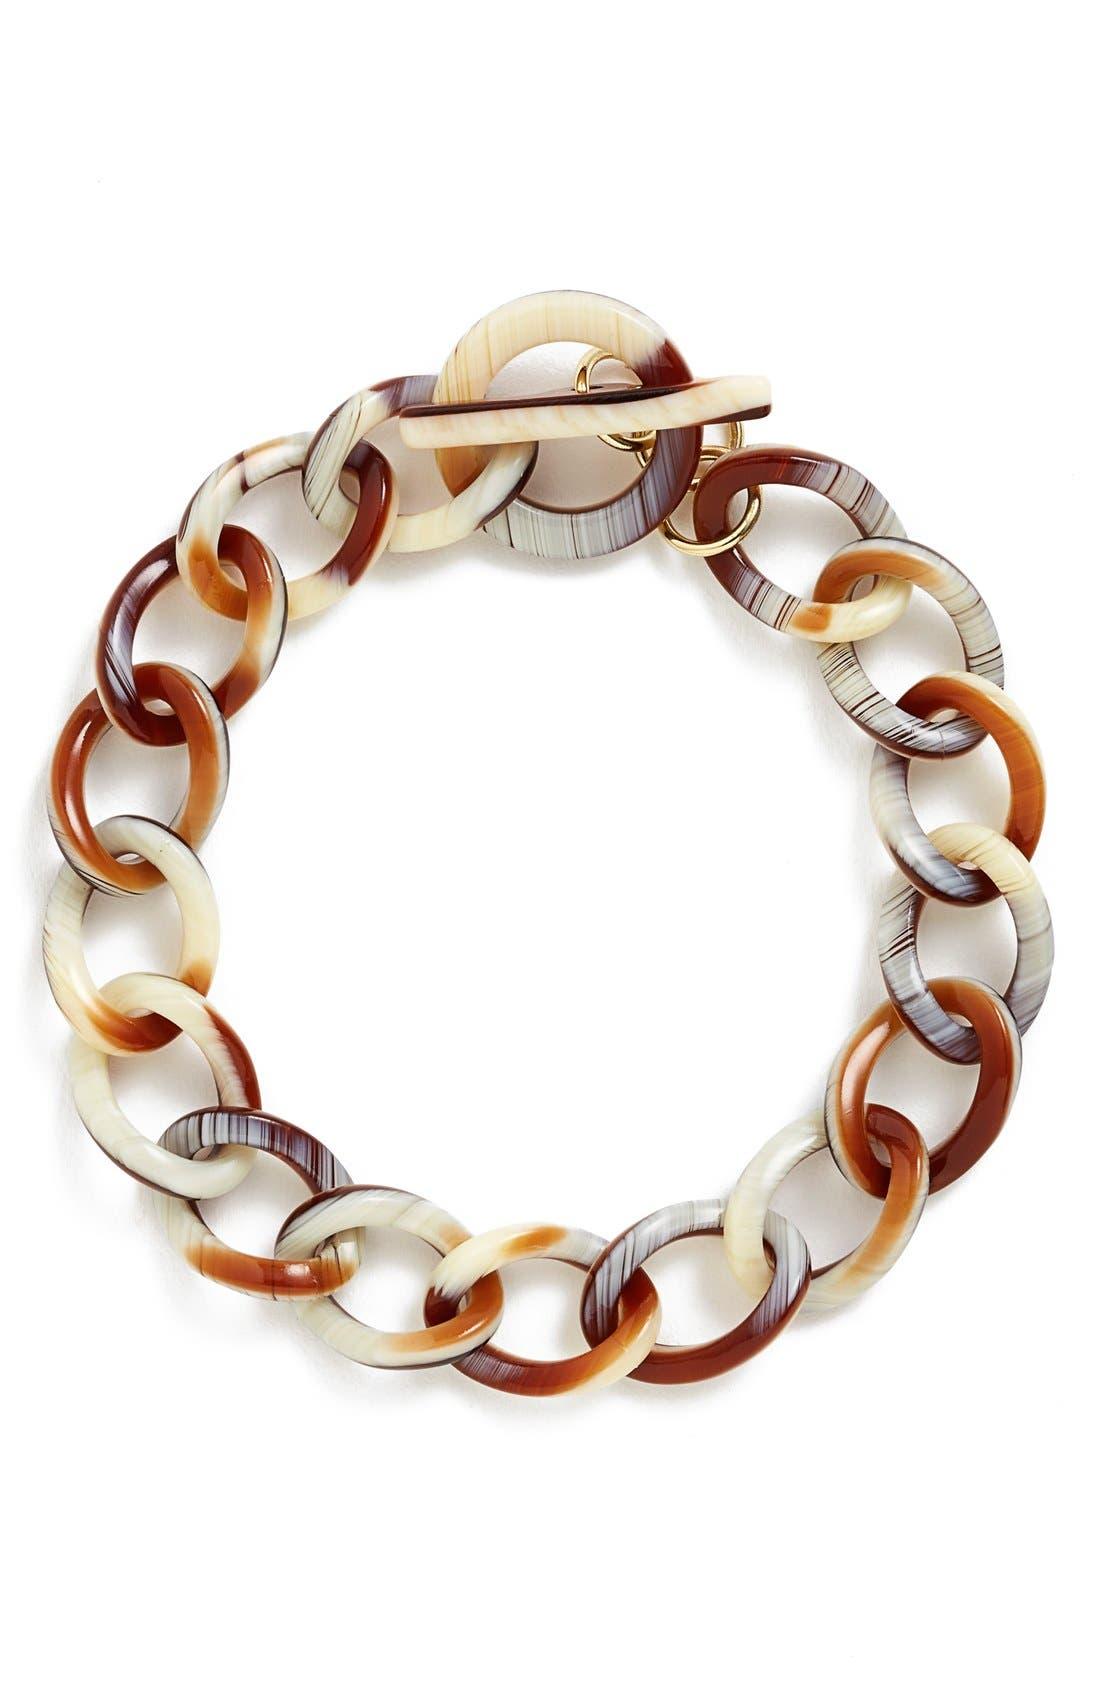 L. Erickson 'Gemma' Link Bracelet